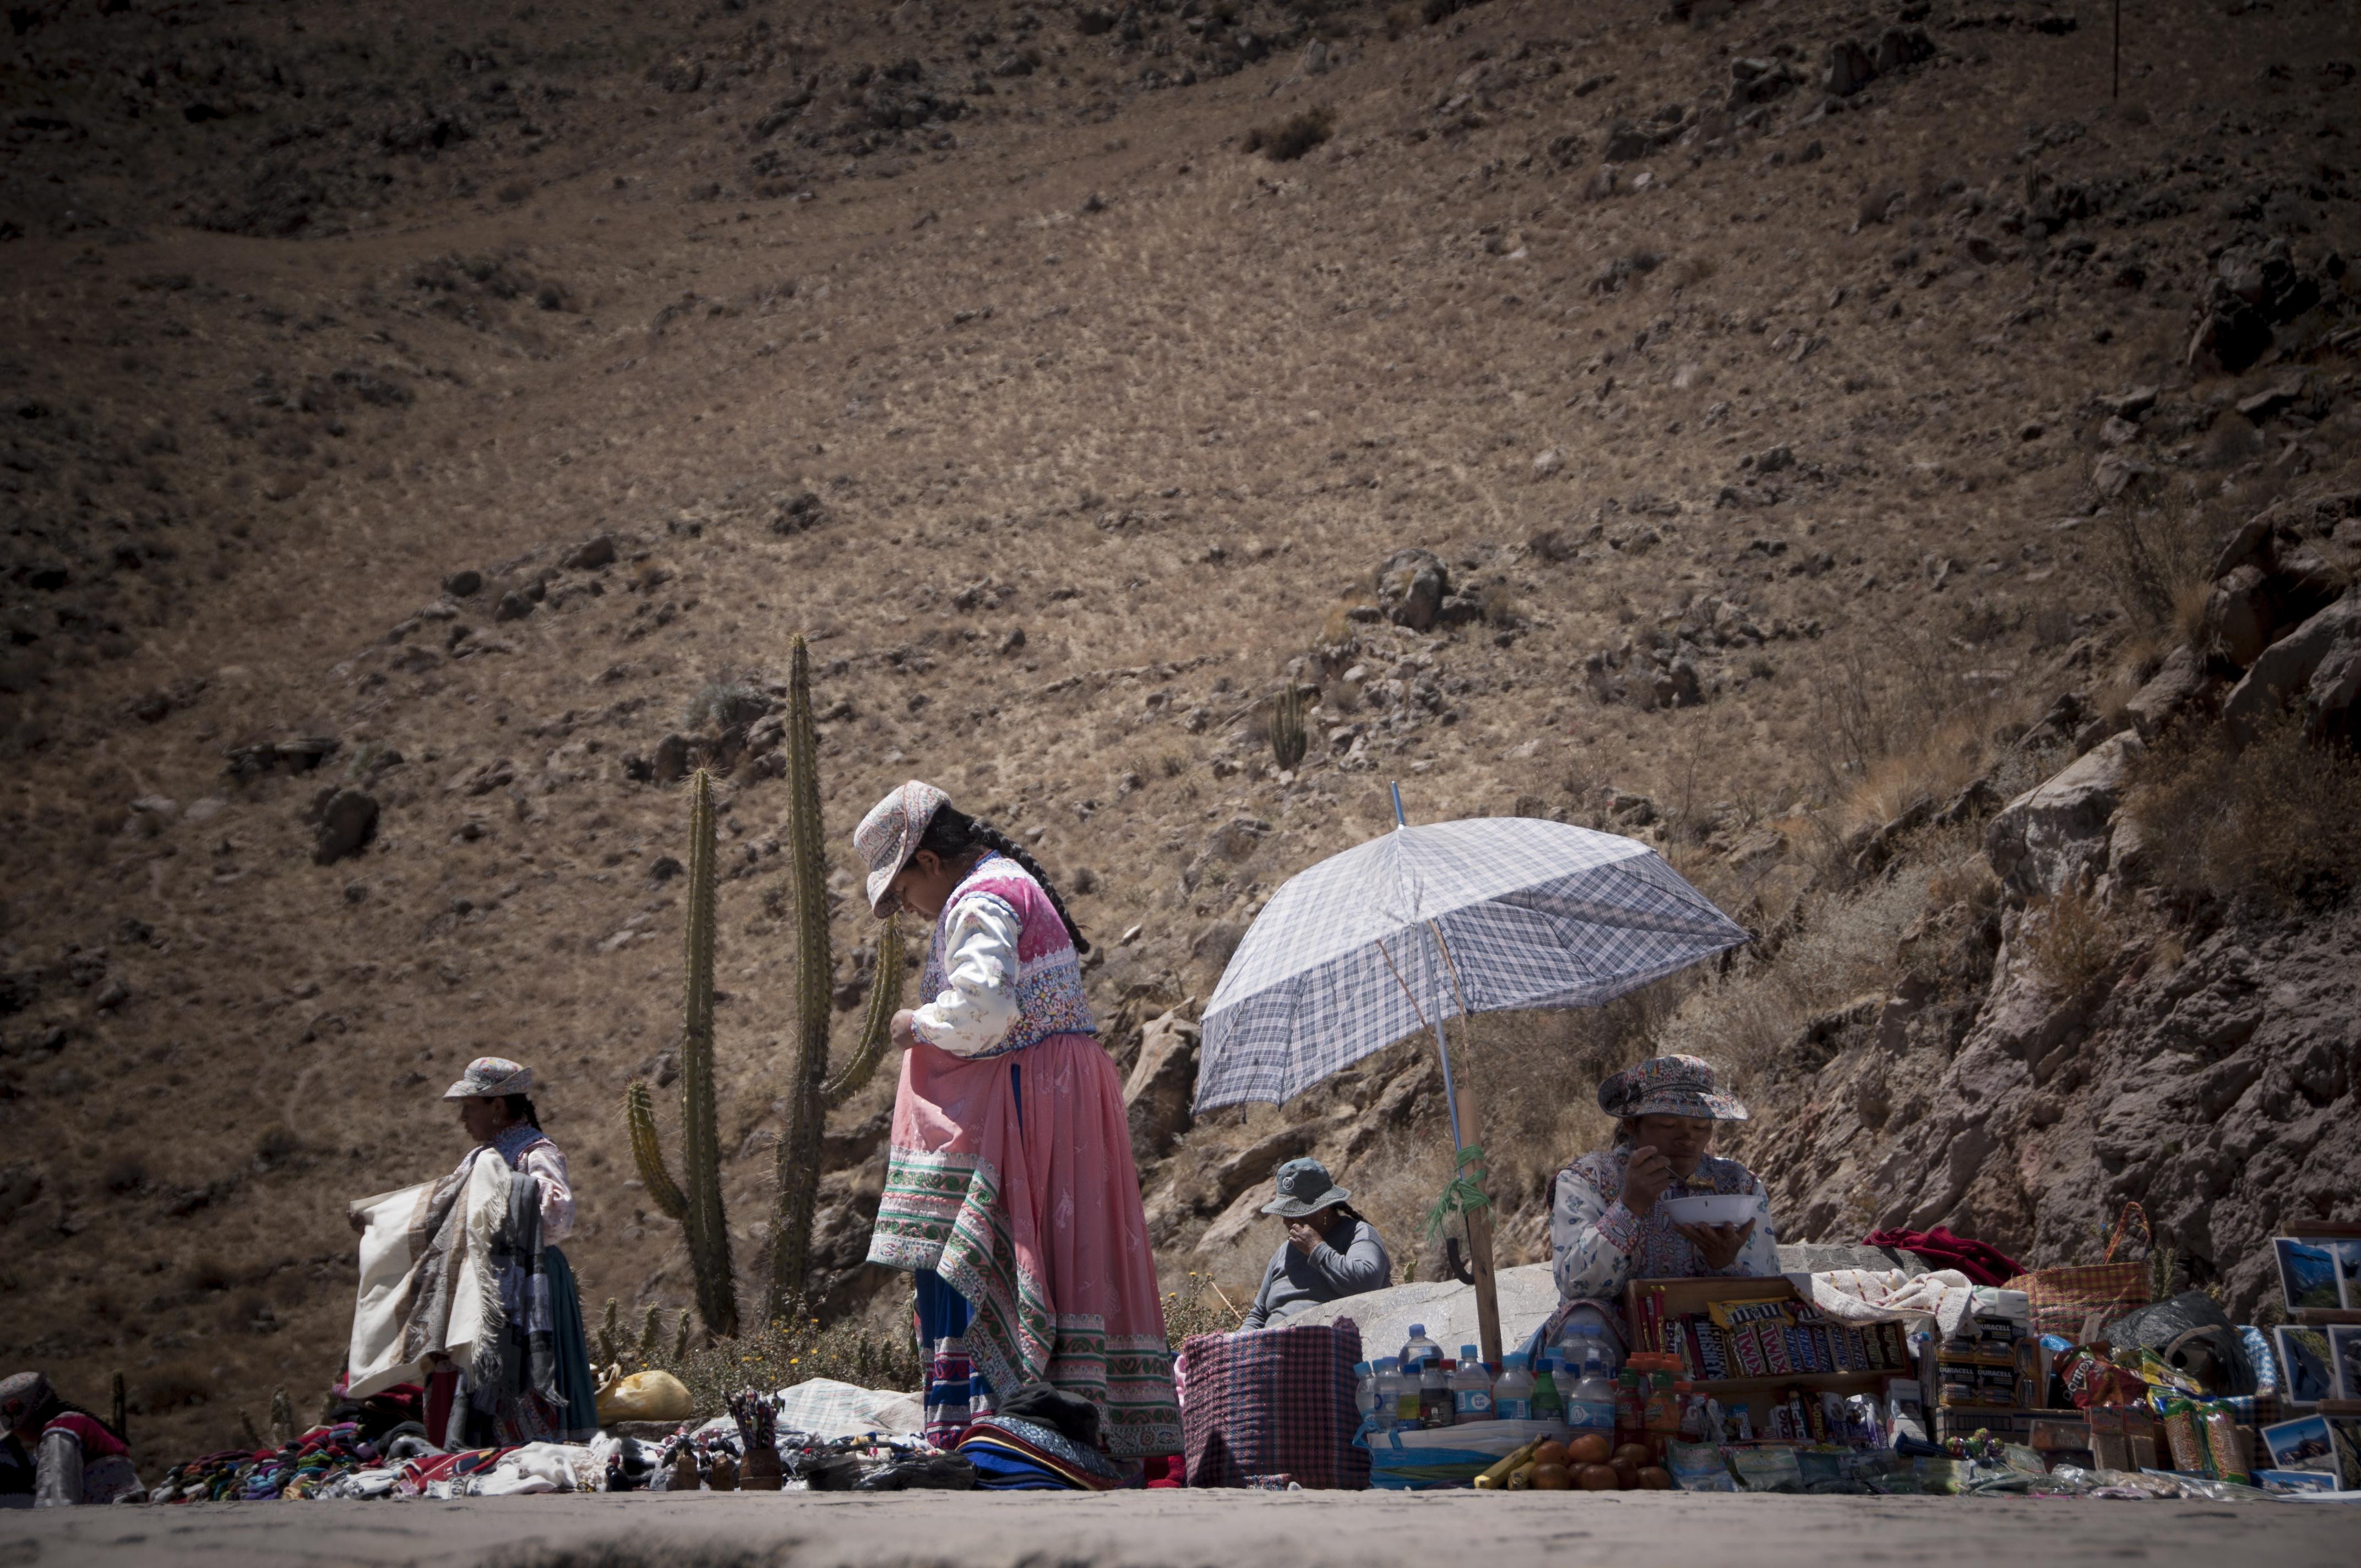 Peru 2013 Cañon del Colca Mirador del condor7